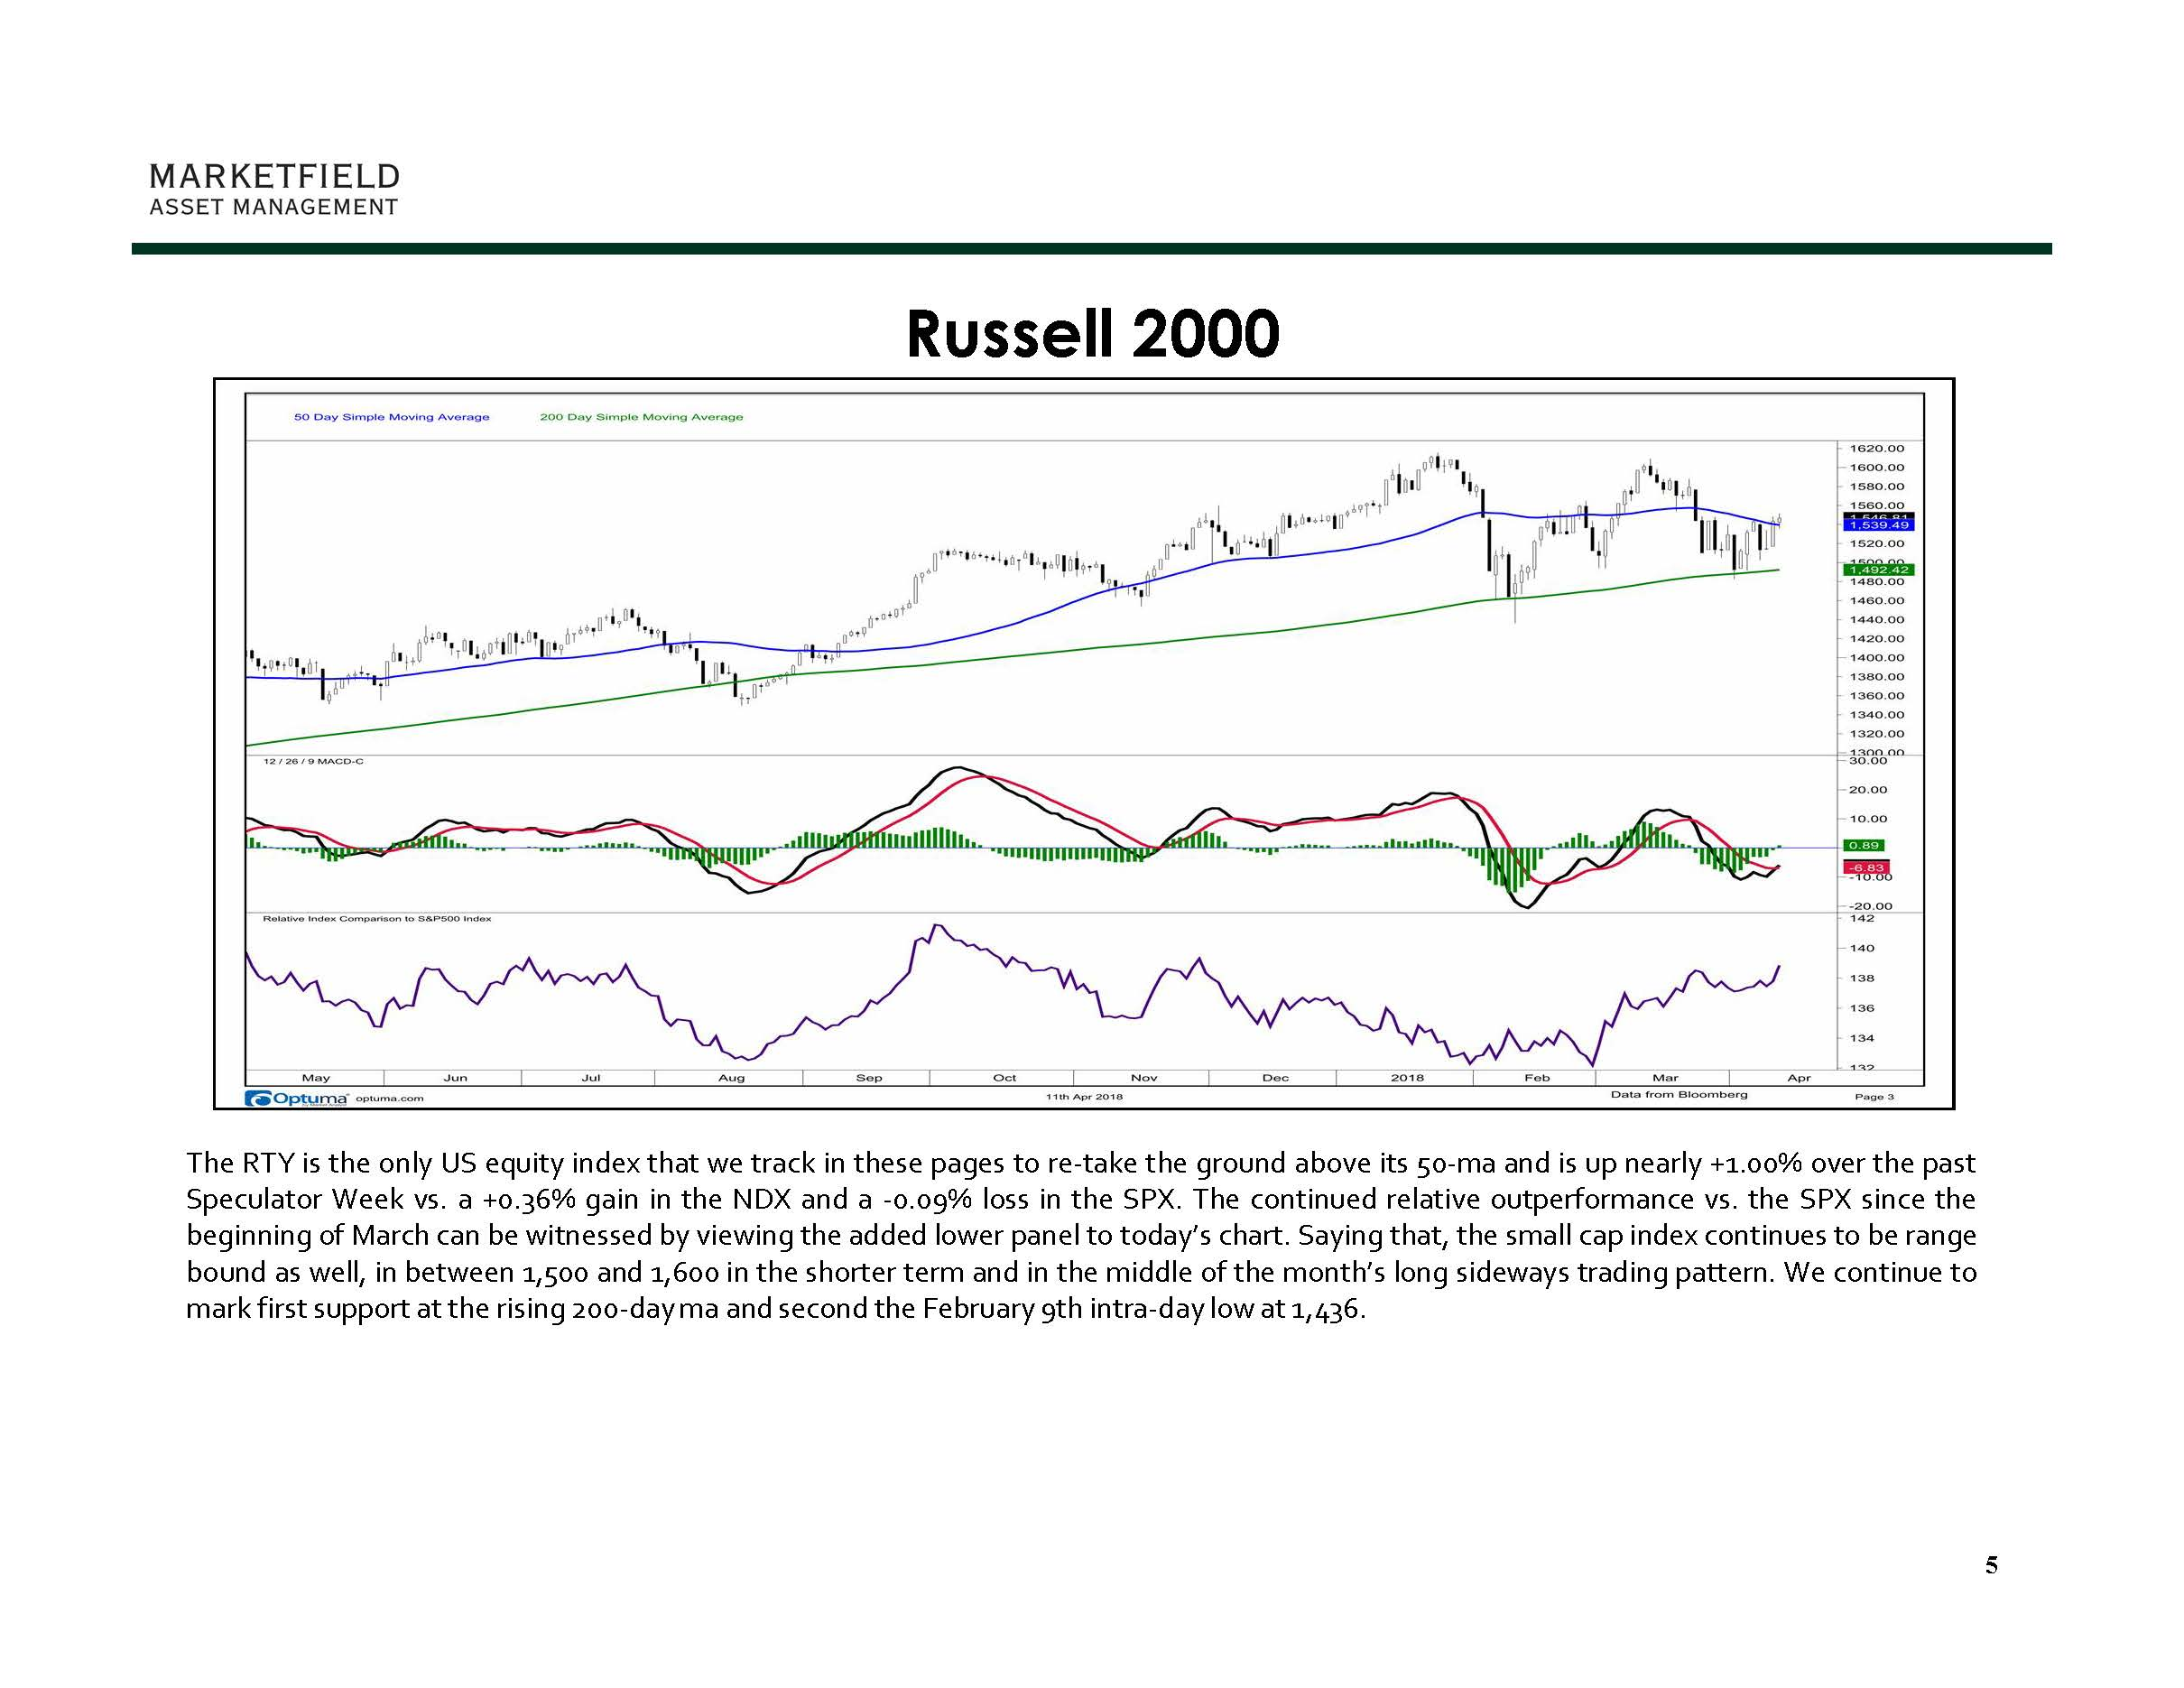 April 12_Marketfield Weekly Speculator_Page_06.jpg